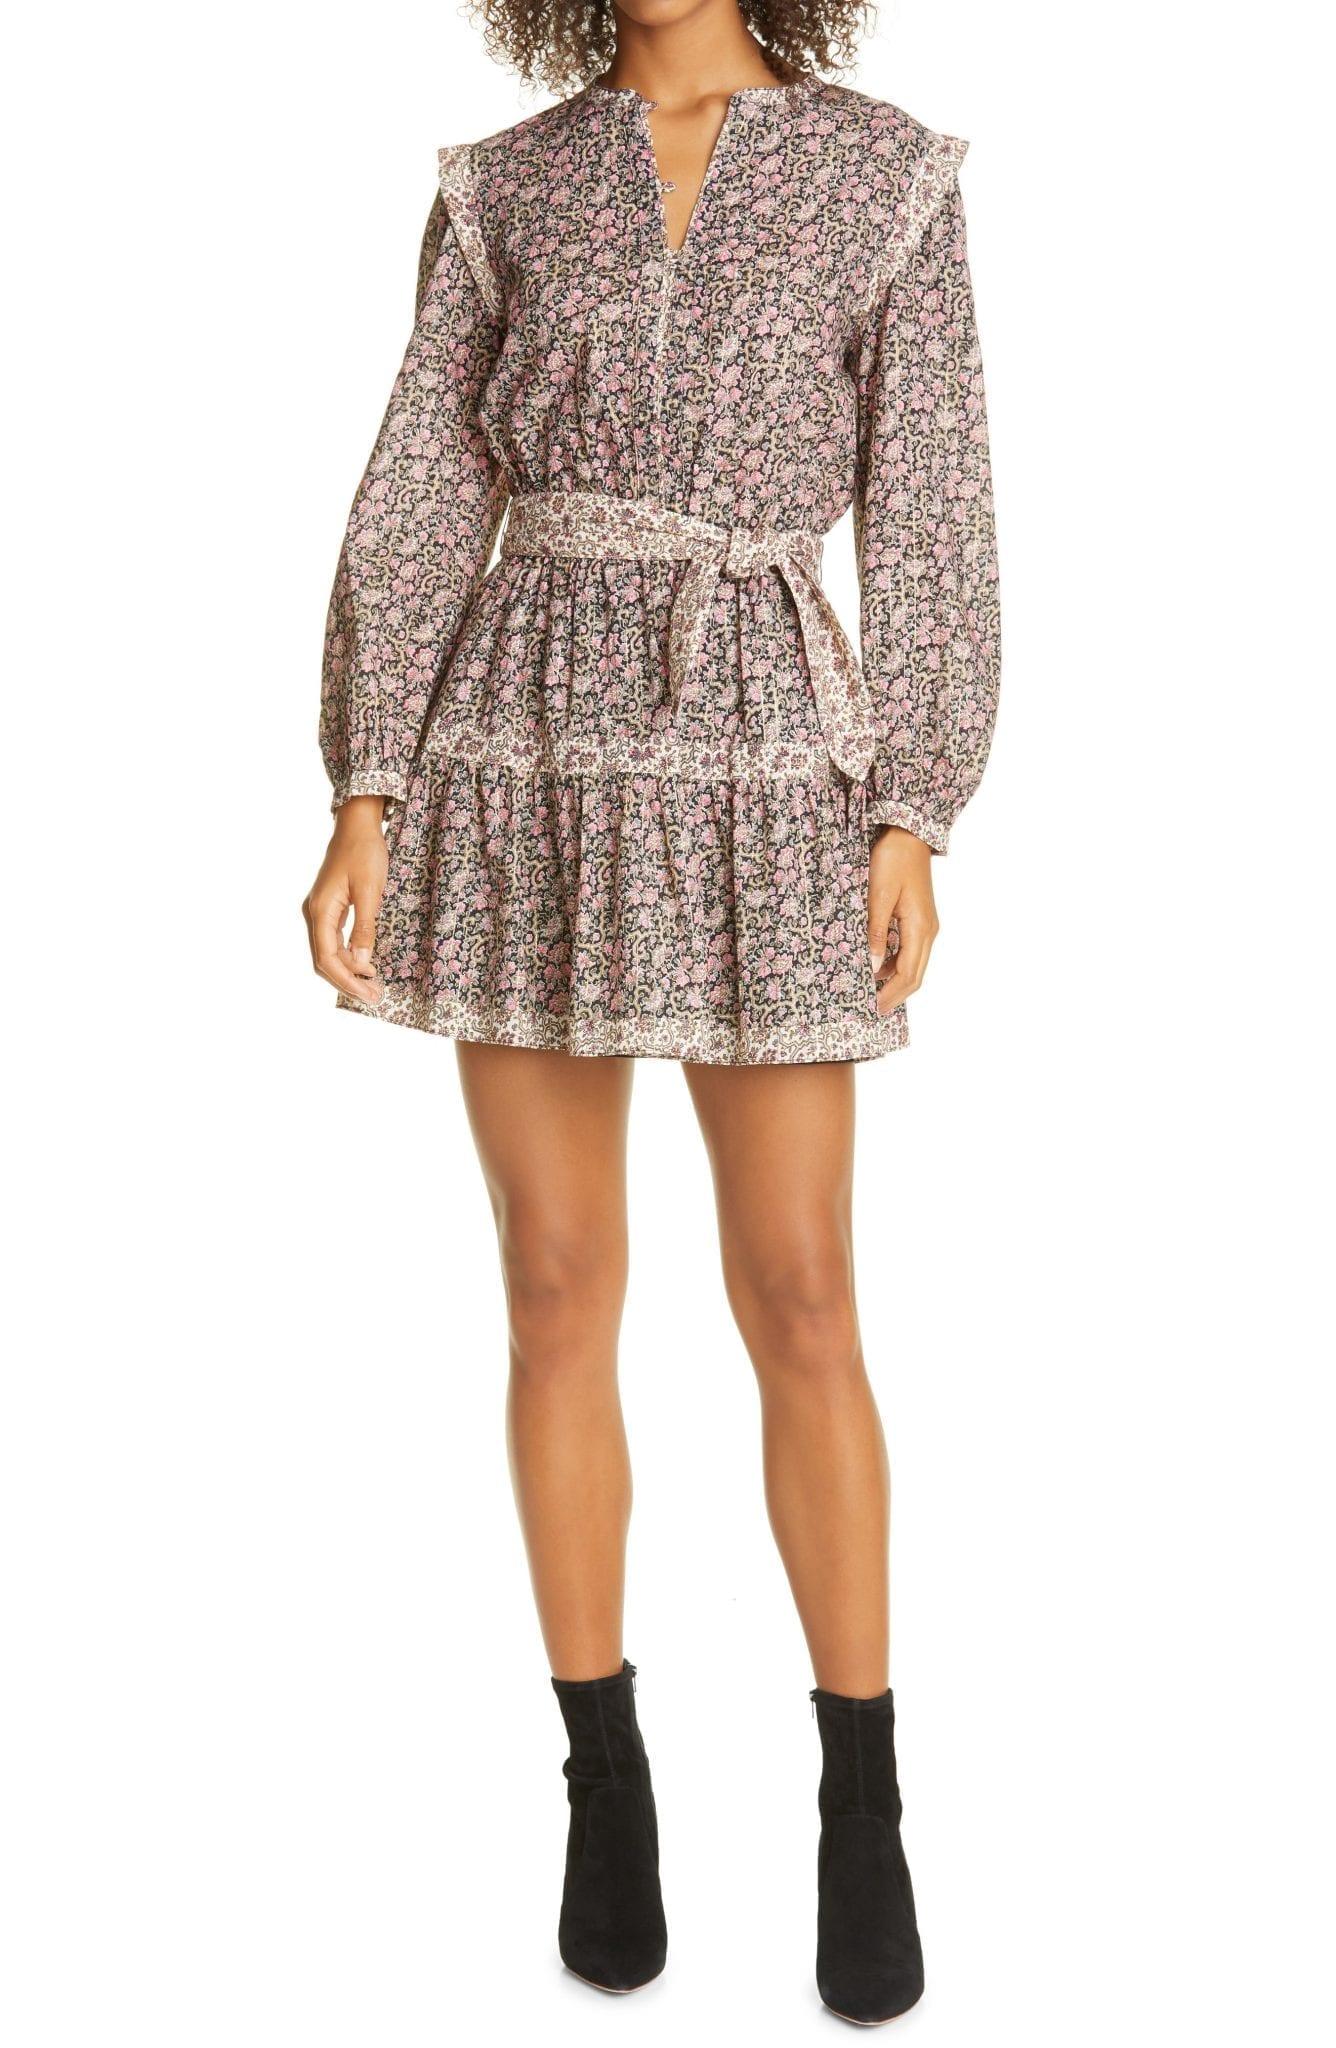 LA VIE REBECCA TAYLOR Floral Mix Belted Long Sleeve Mini Dress